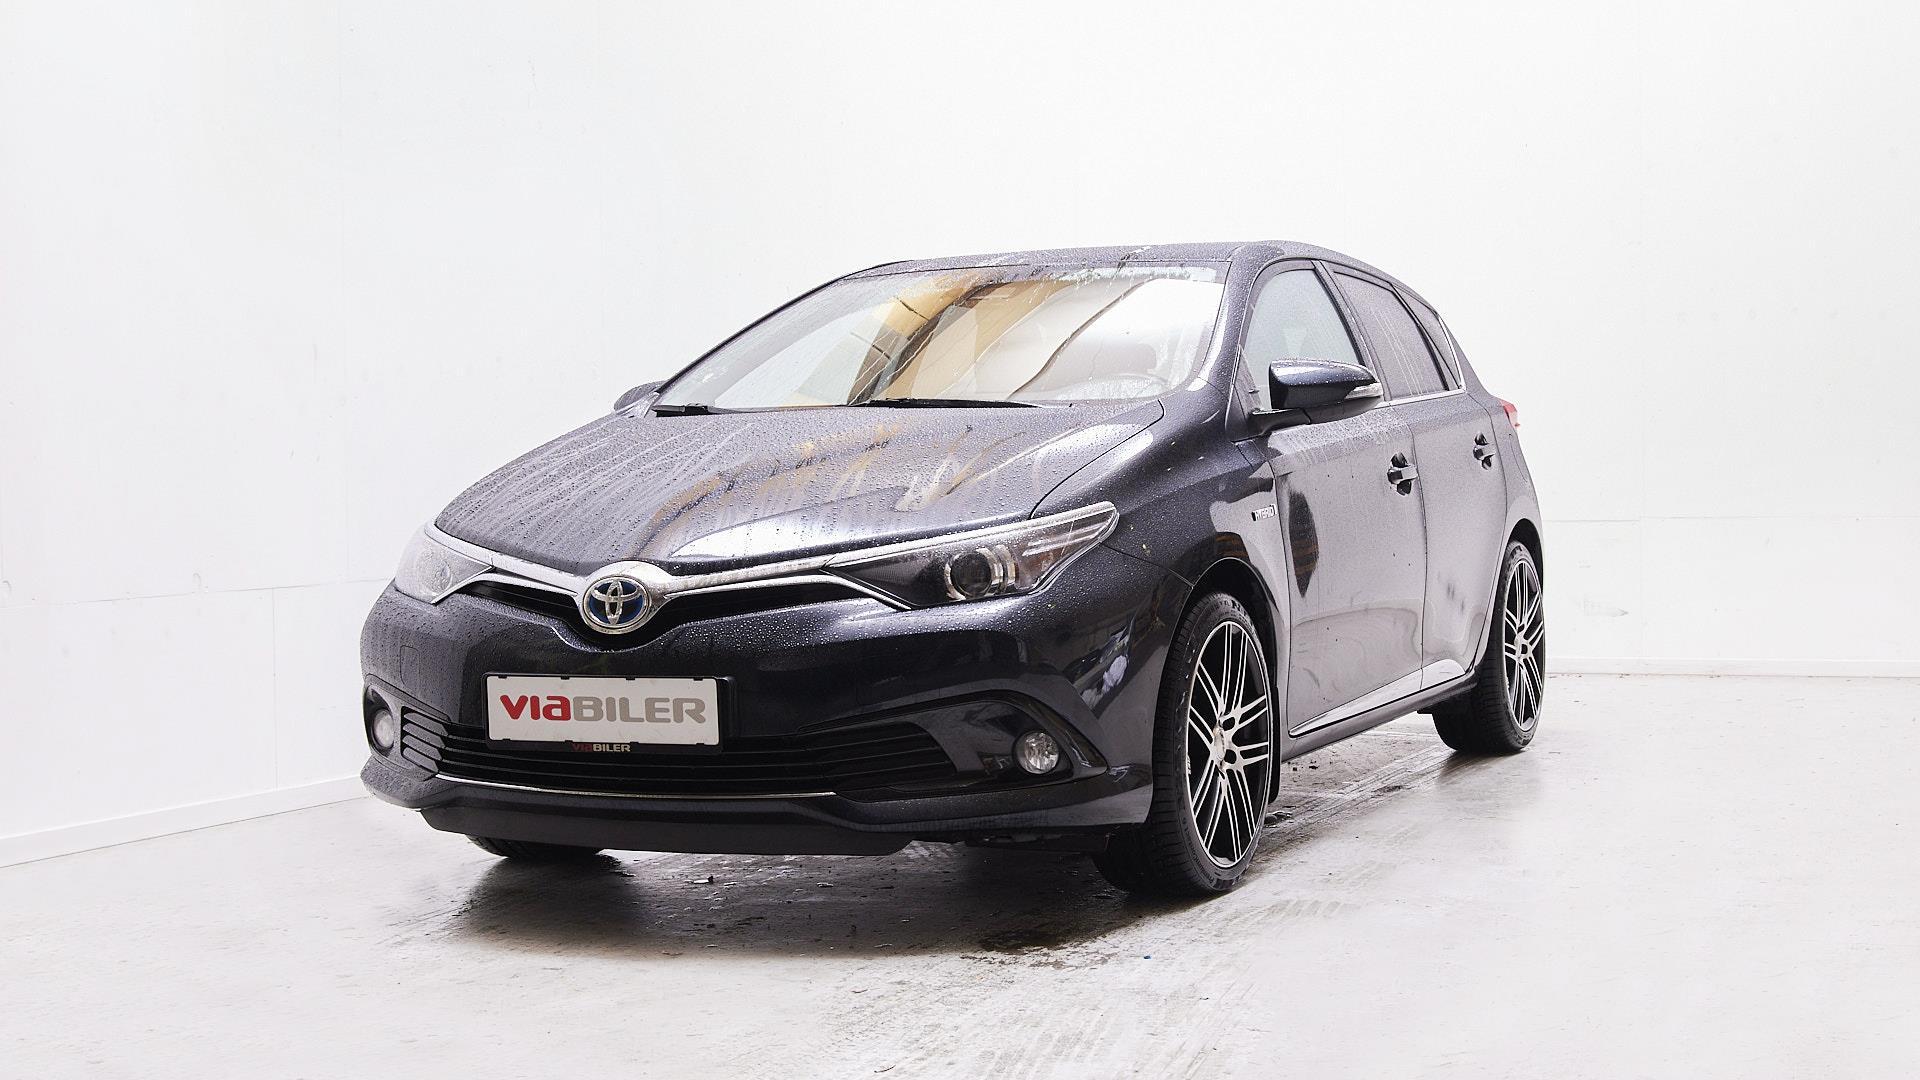 Billede af Toyota Auris 1,8 B/EL H2 Comfort 136HK 5d Aut.